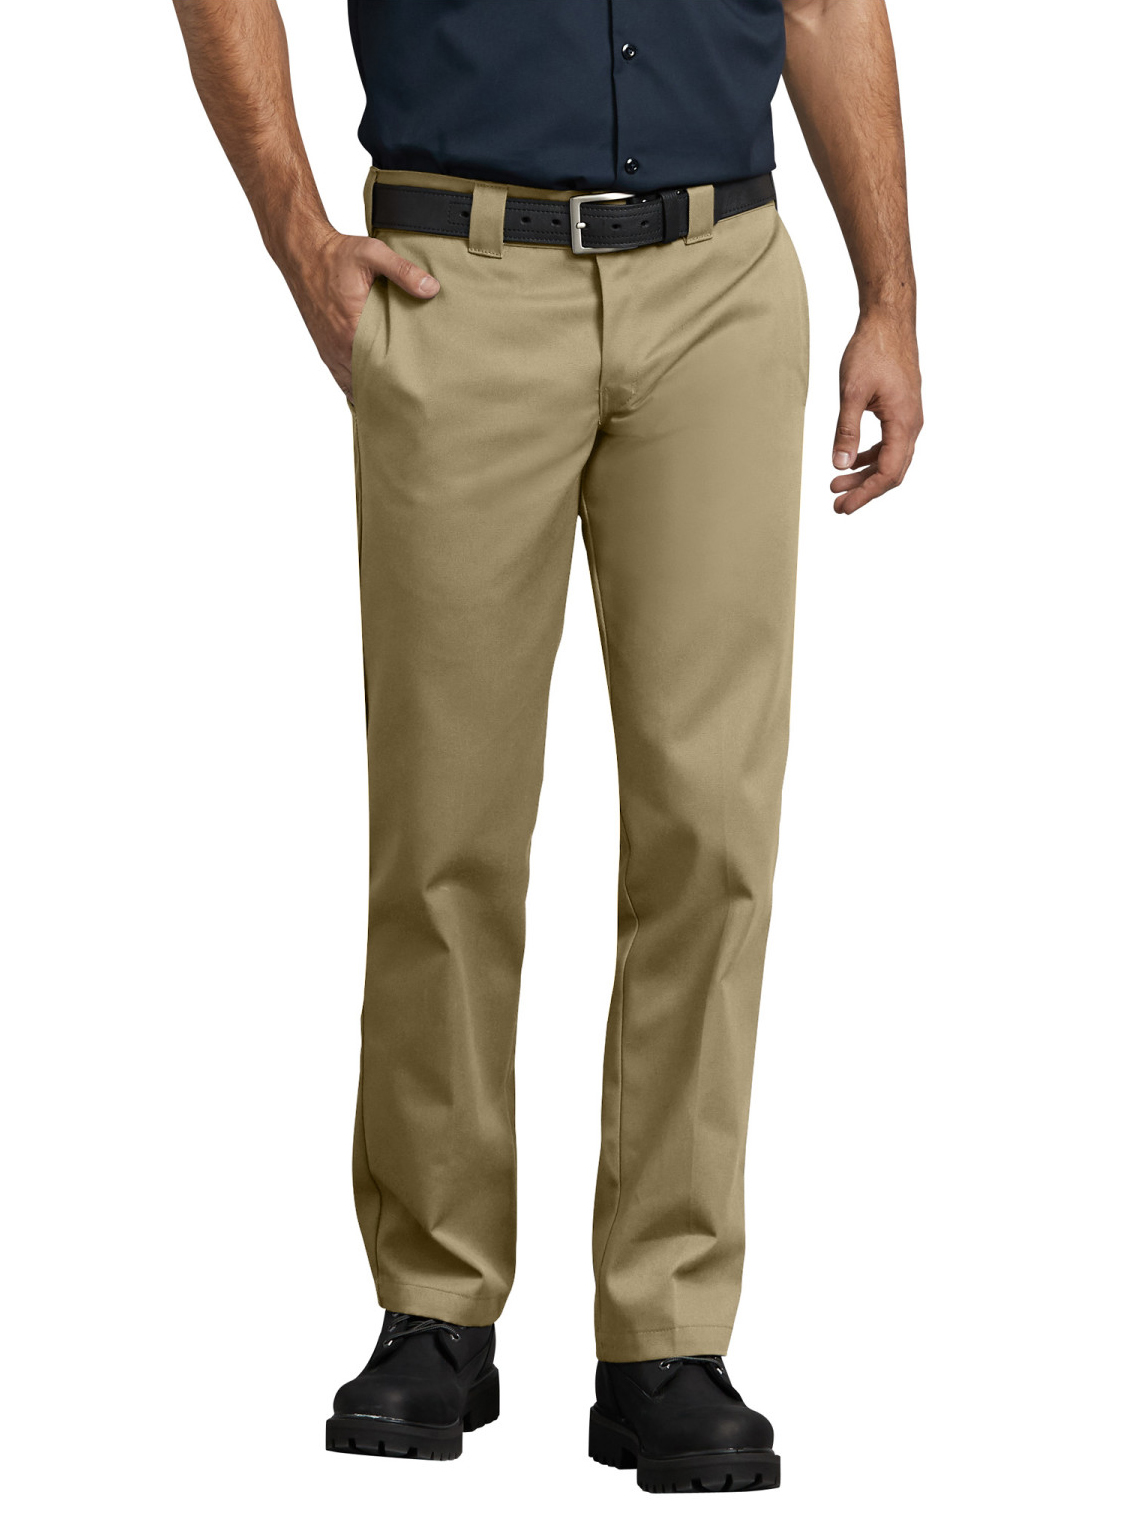 Dickies WP873 Men/'s Charcoal Slim Fit Straight Leg Work Pant Workwear